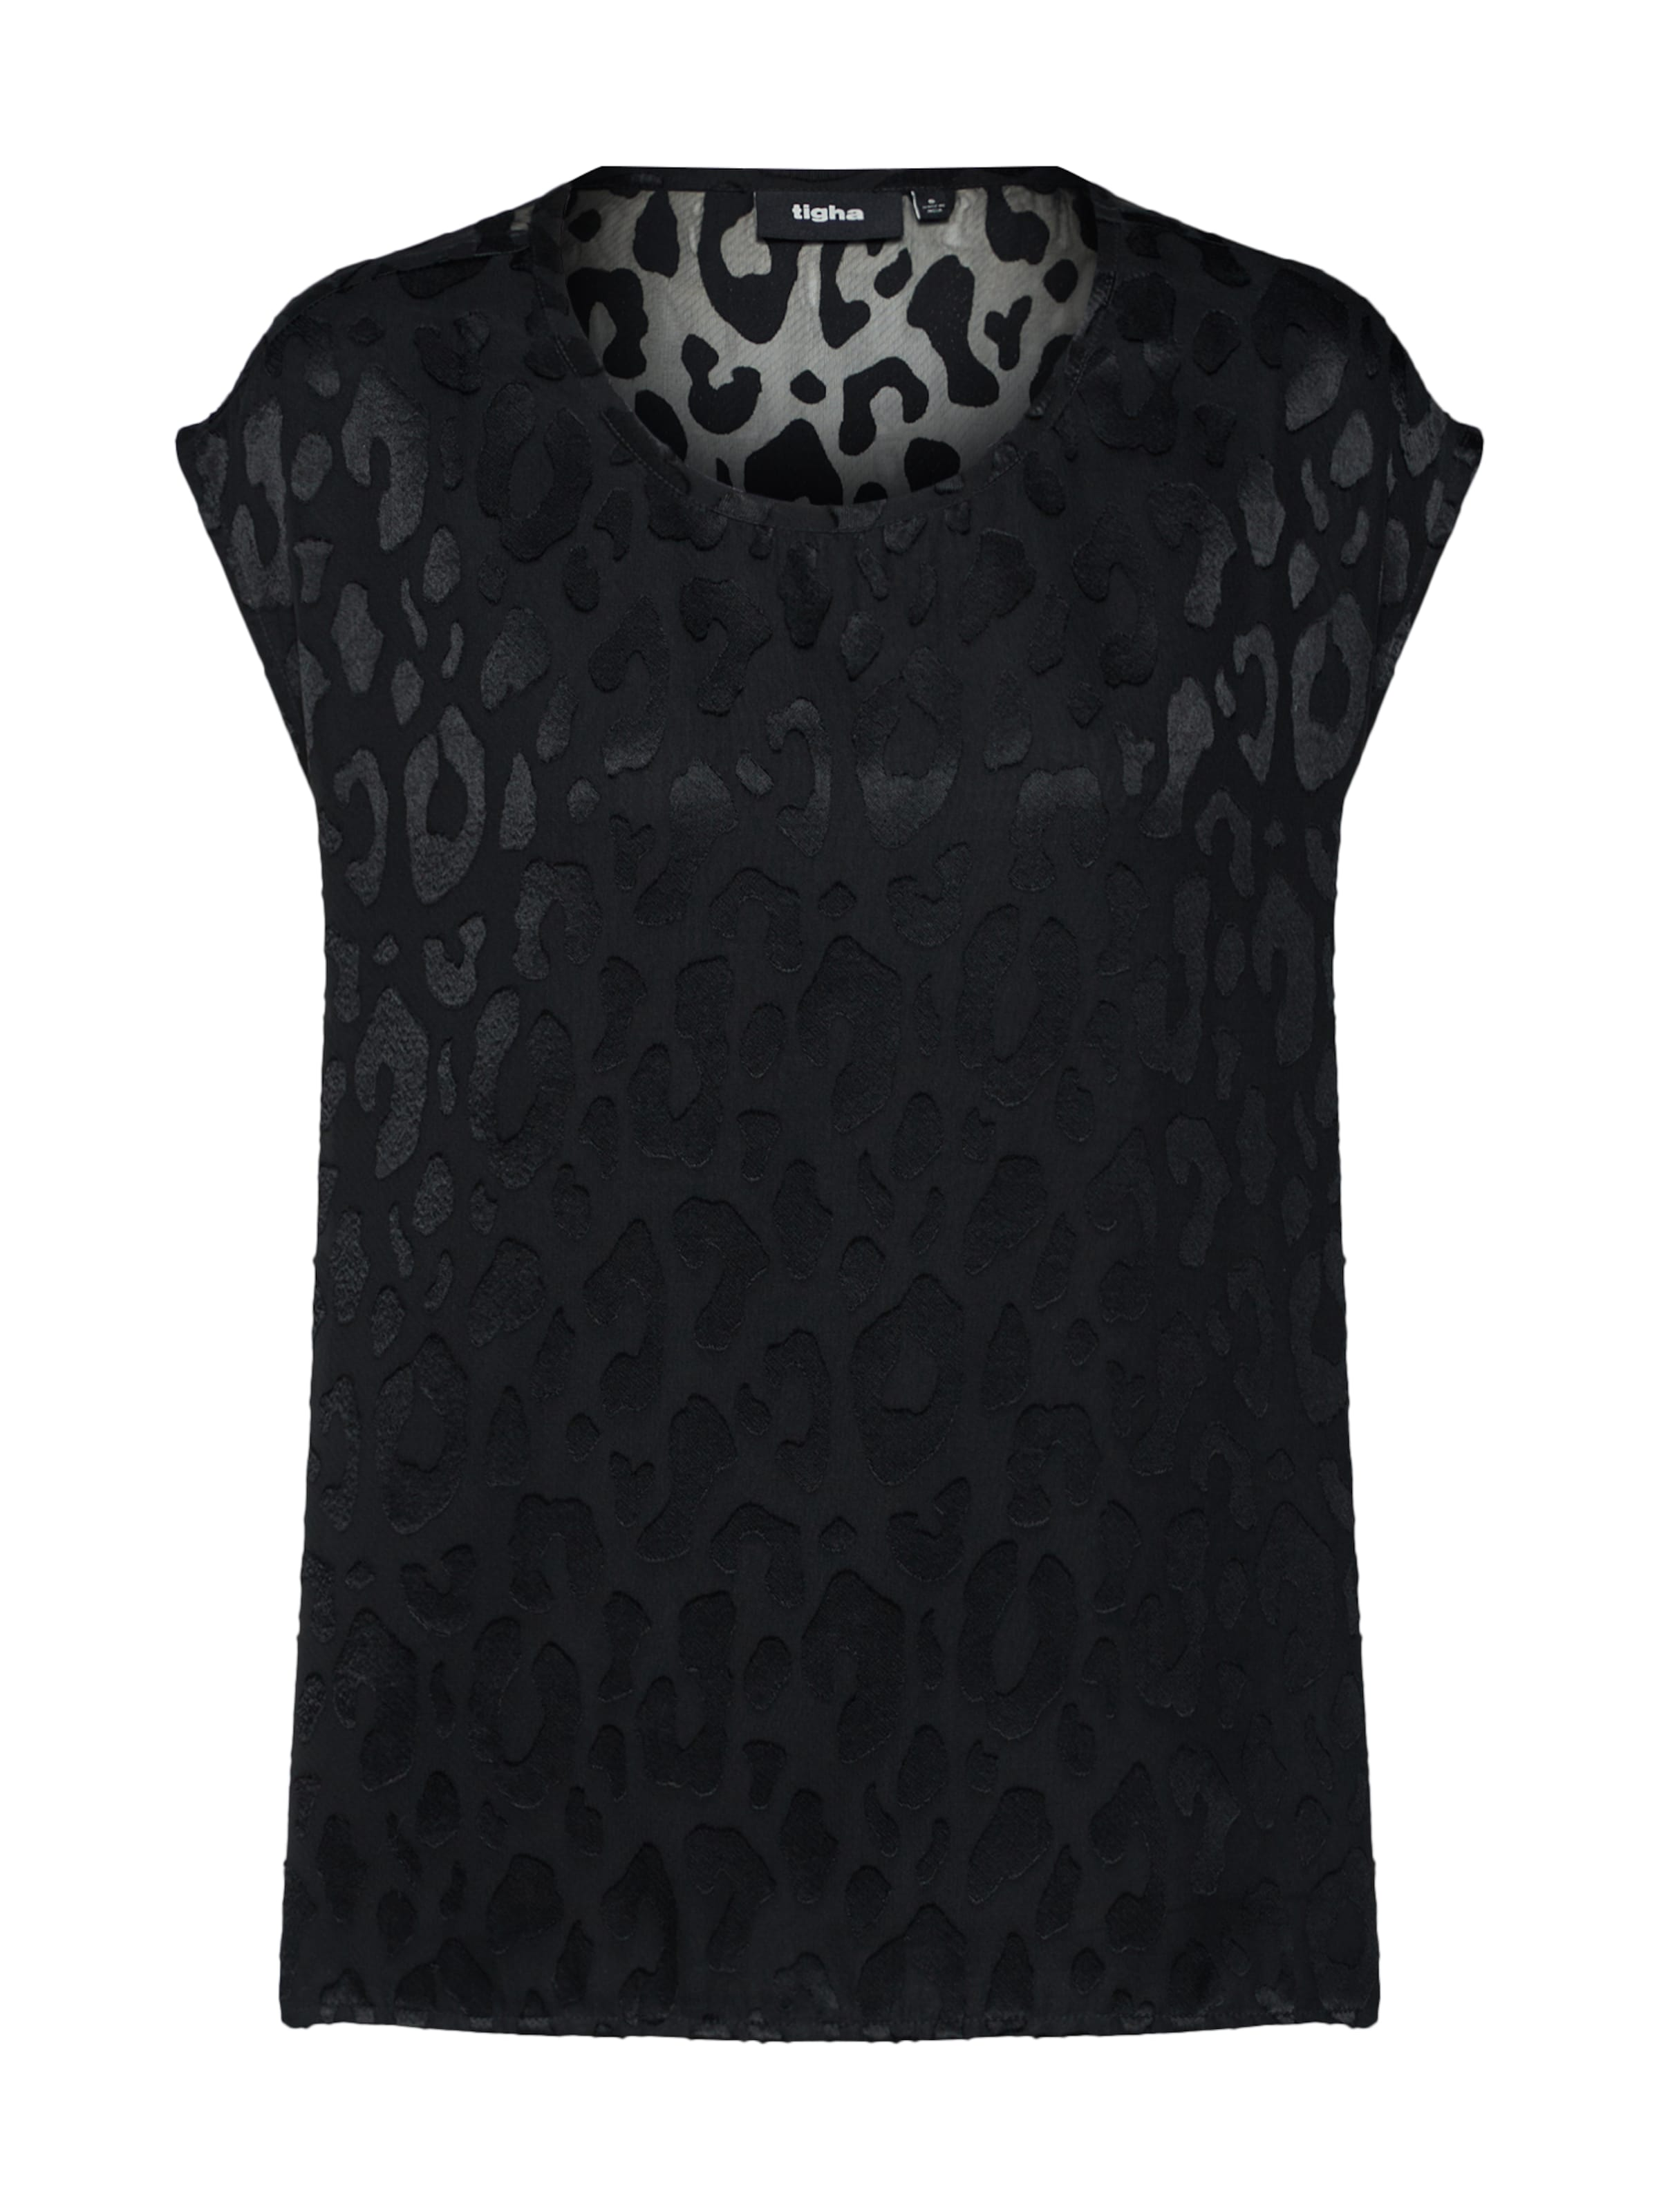 En Tigha shirt T Leo' Noir 'linja 7fgyYb6